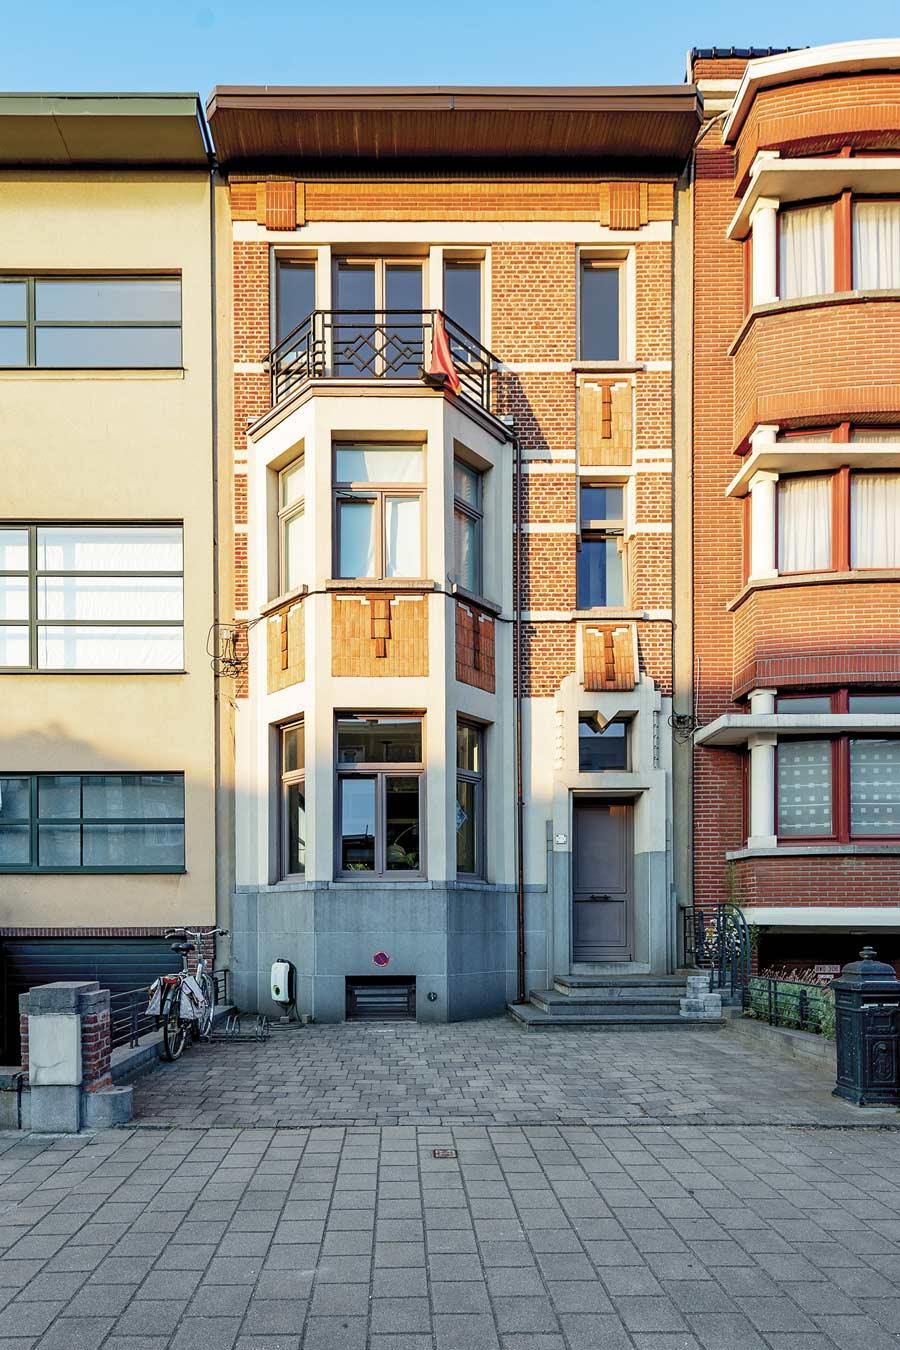 focus-archi-magazine-architecture-polygoon-facade-exterieur-cote-rue.jpg